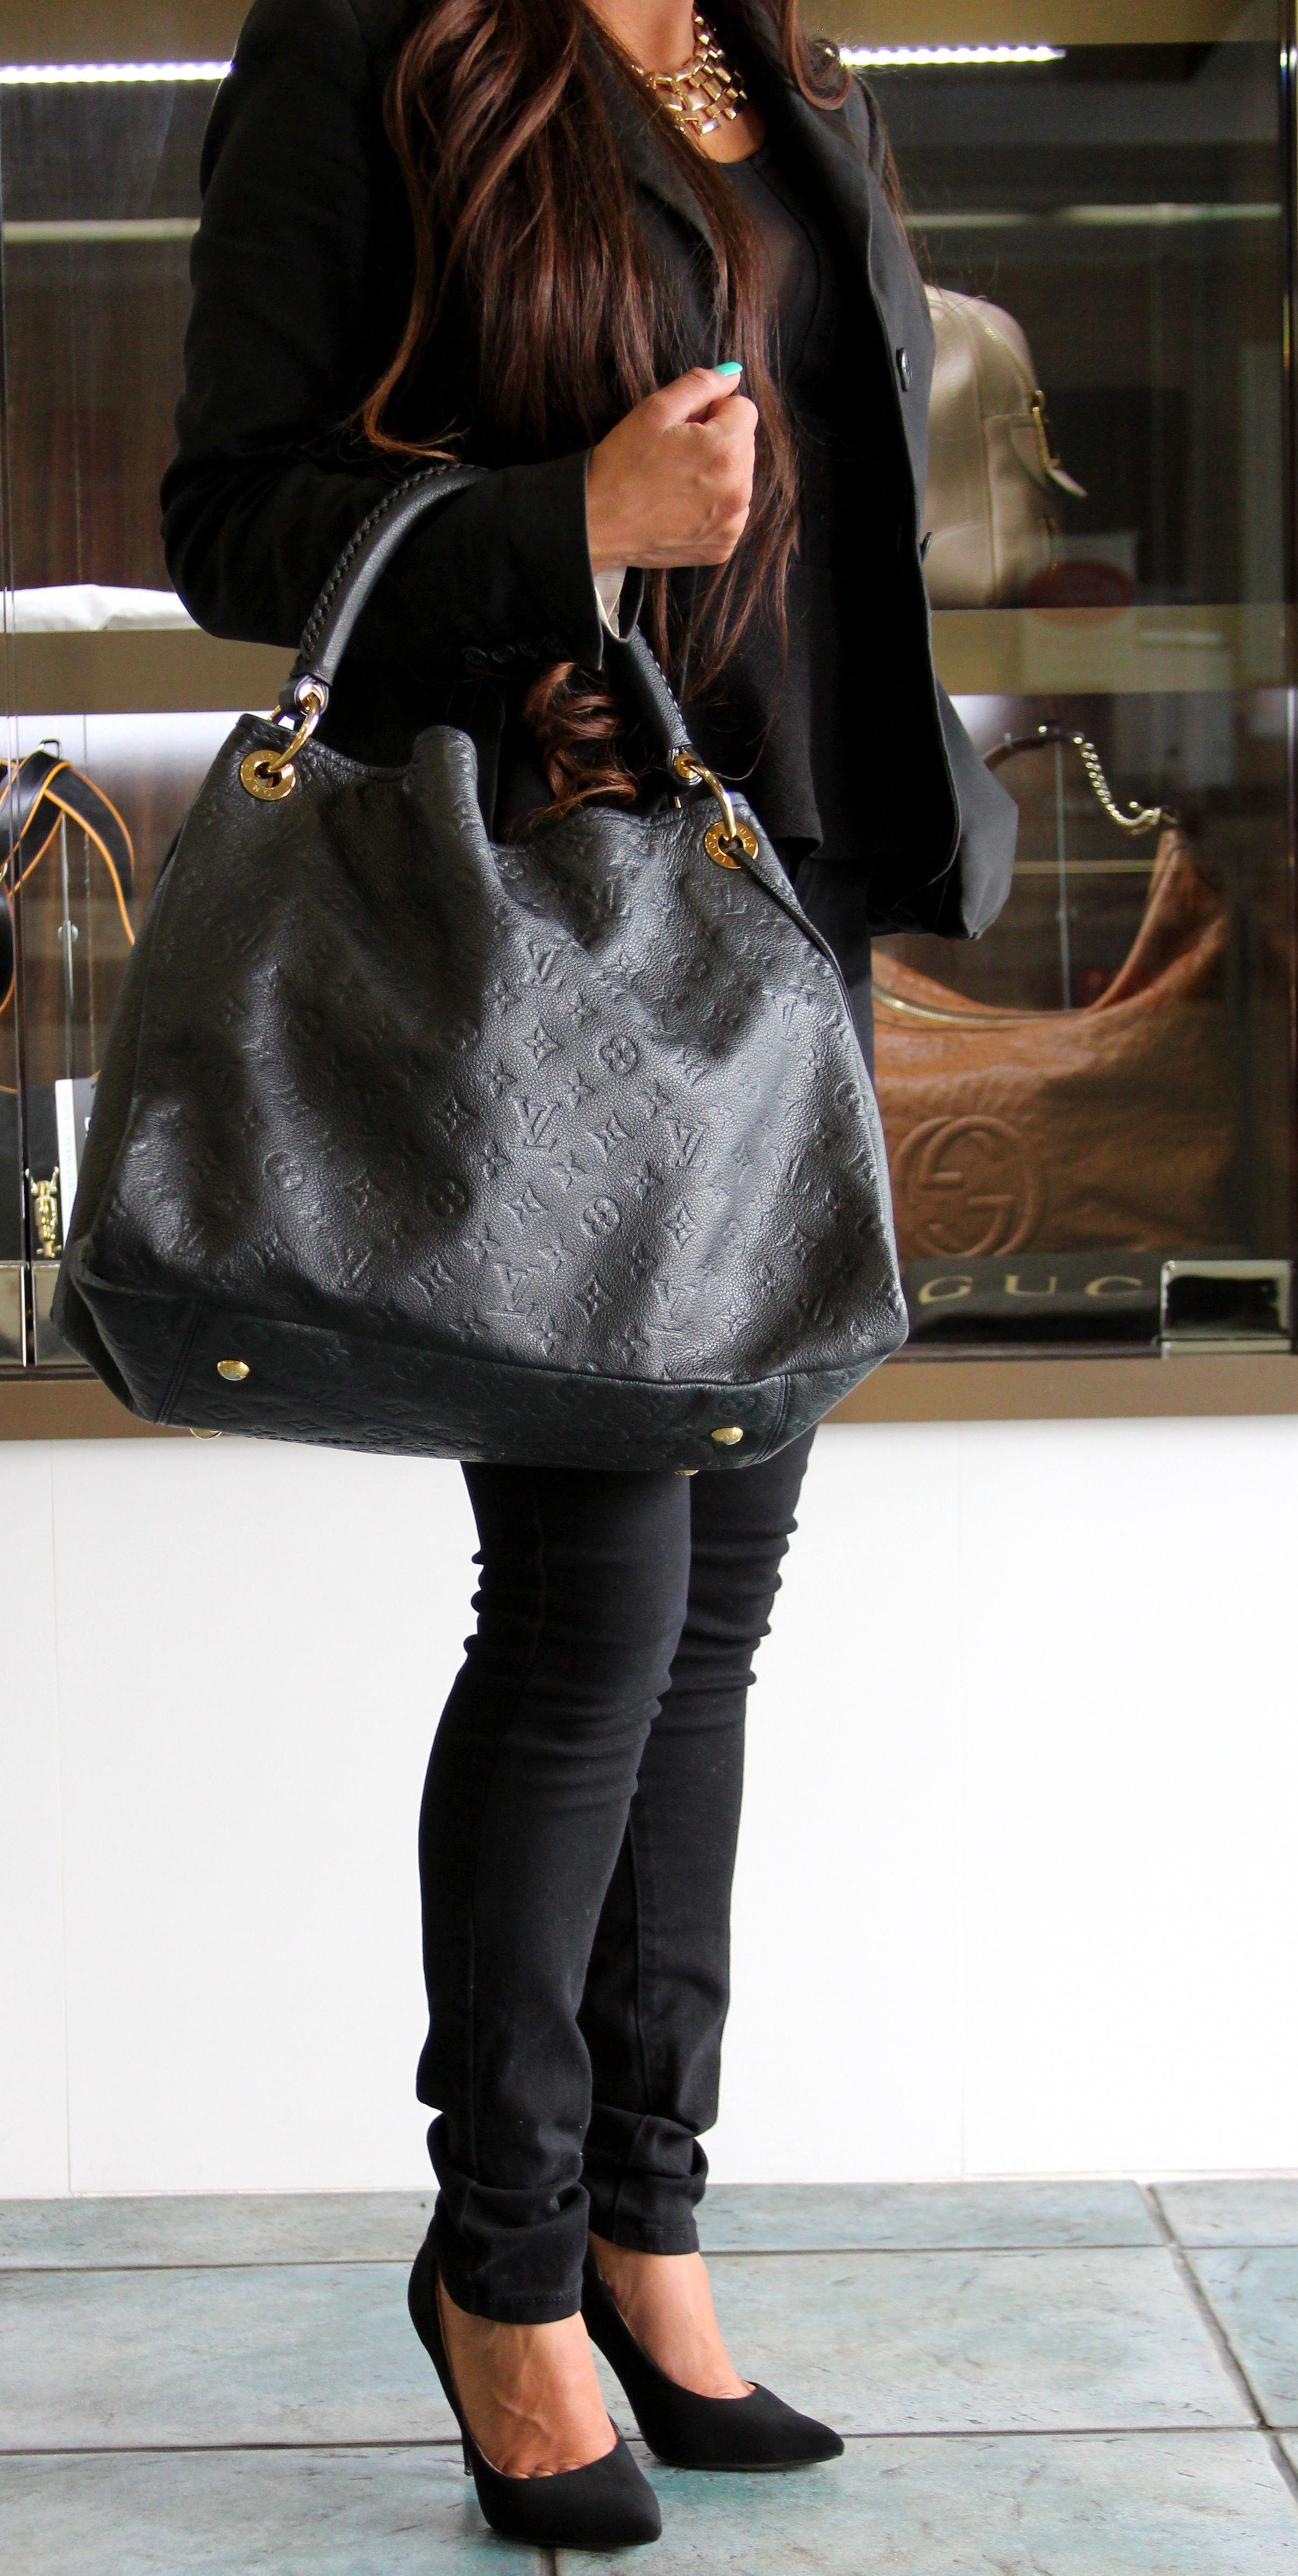 Louis Vuitton Artsy Monogram Empreinte Leather Infini. Perfect summer tote  bag!  summer   a3581d34920d1